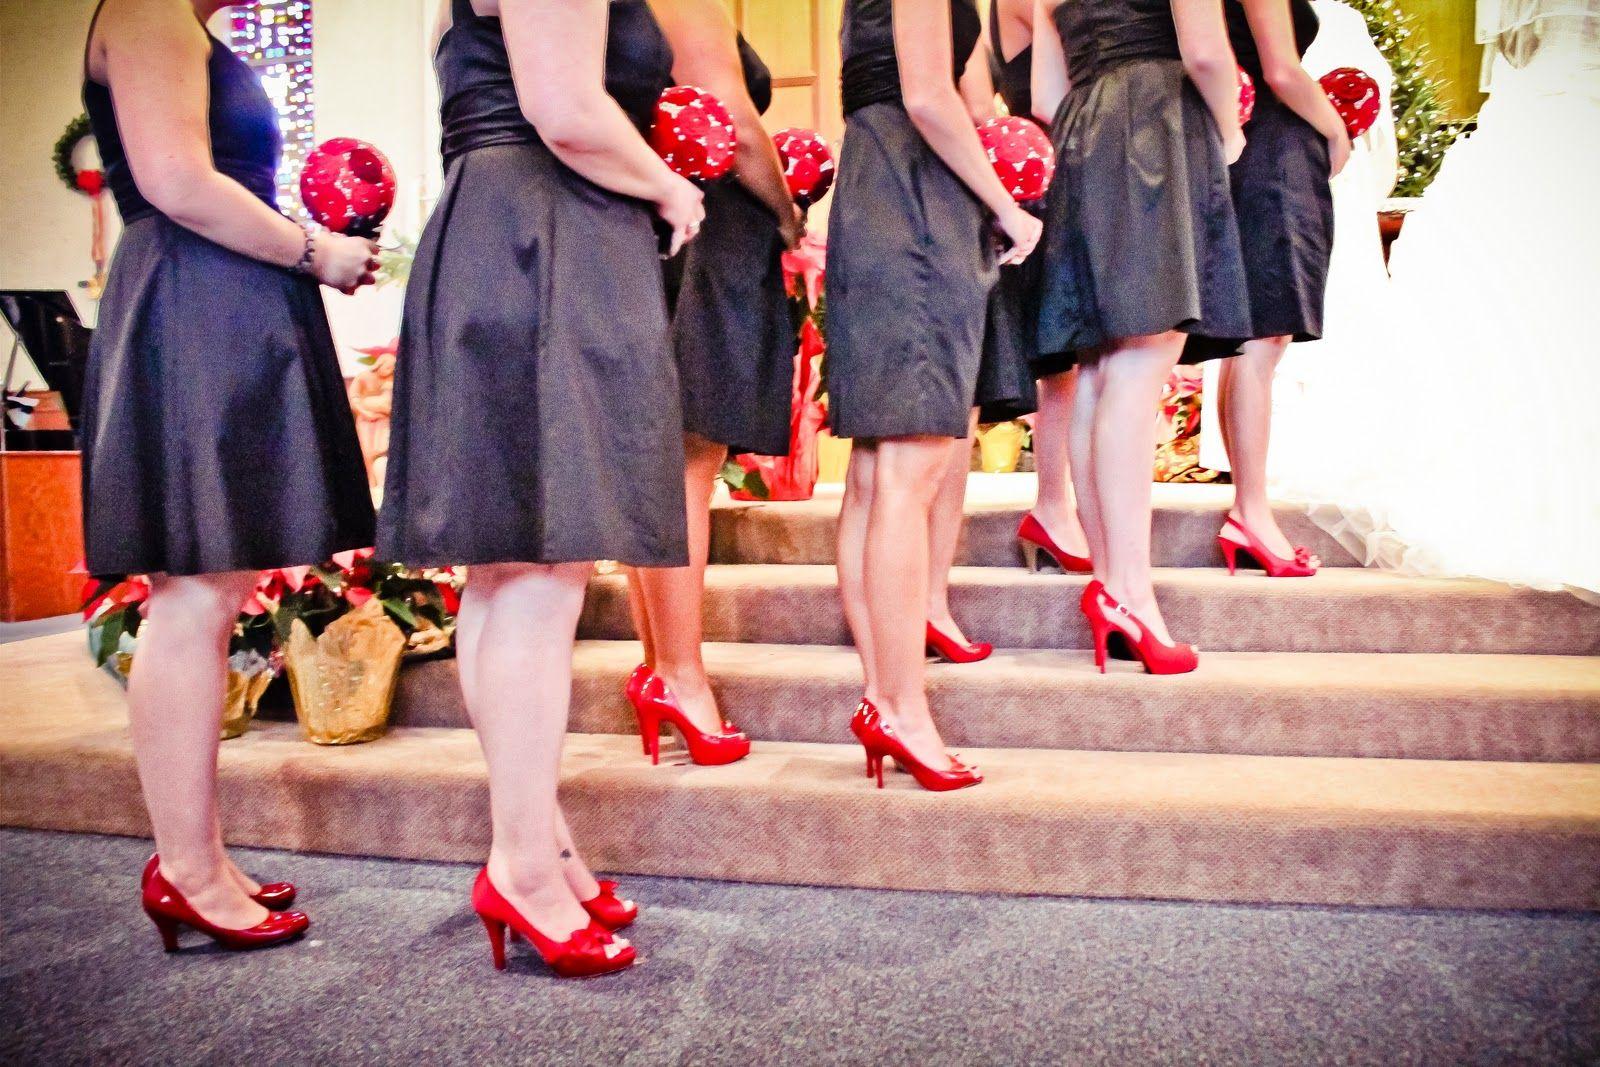 Bridesmaids In Black Dresses Google Search Black Dress Red Shoes Black Dress Red Heels Red Bridesmaids [ 1067 x 1600 Pixel ]